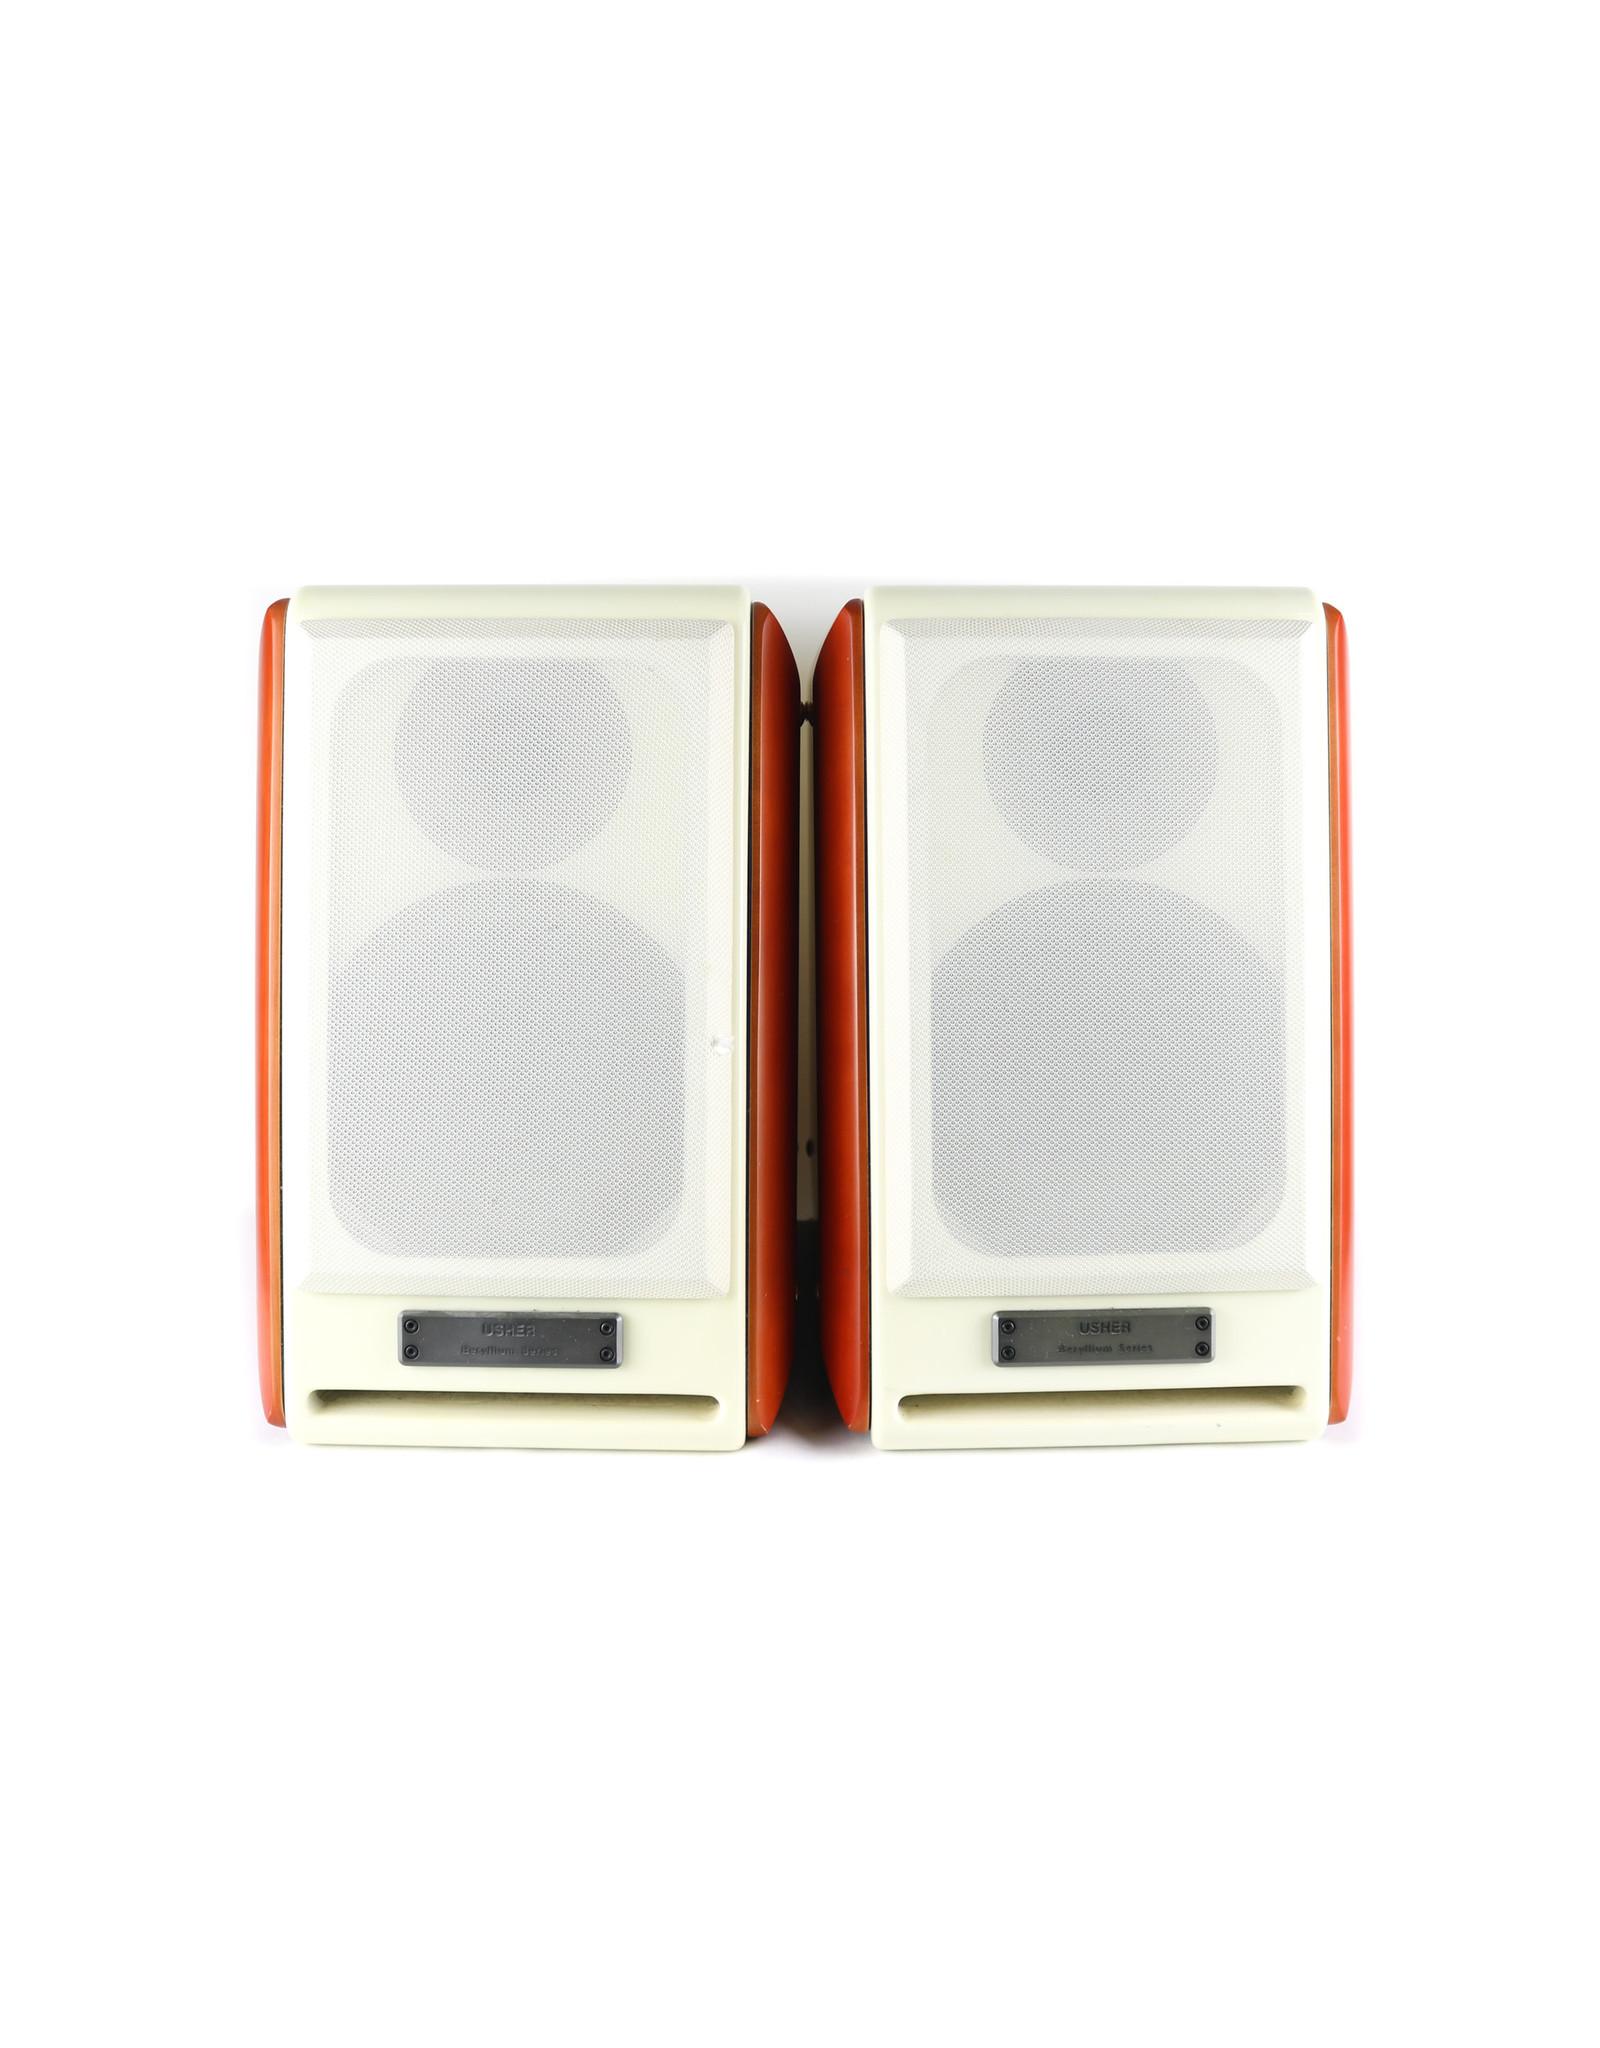 Usher Usher Compass BE-718 Bookshelf Speakers USED